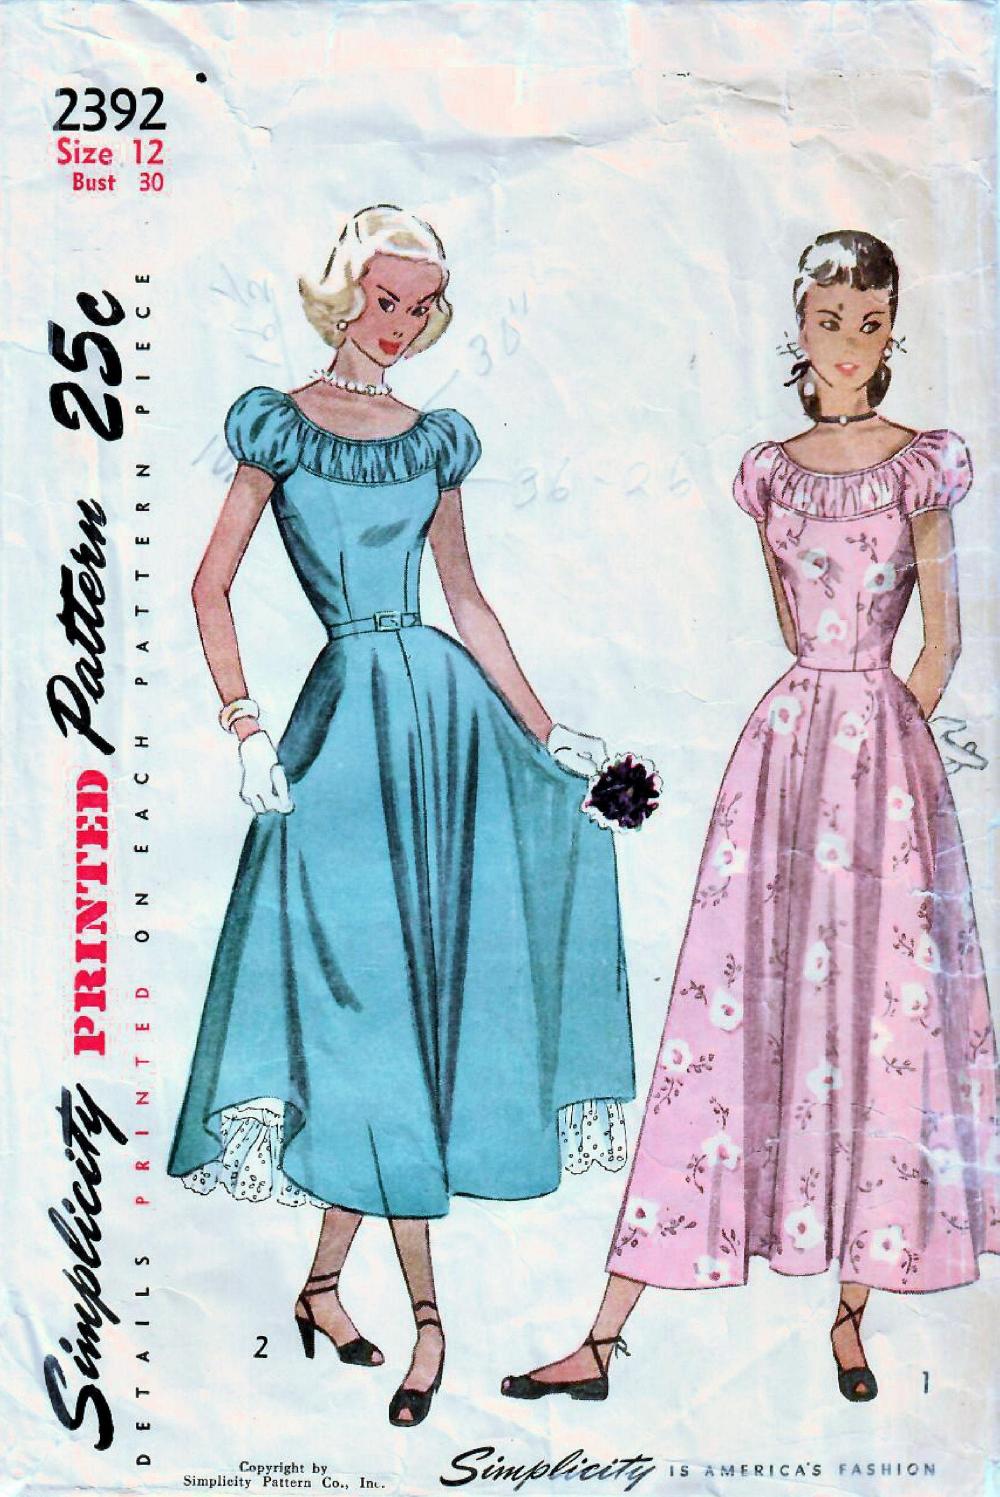 1940s Simplicity 2392 Vintage Sewing Pattern Misses Midi Etsy In 2021 Simplicity Patterns Dresses Prom Dress Pattern Evening Dress Patterns [ 1497 x 1000 Pixel ]